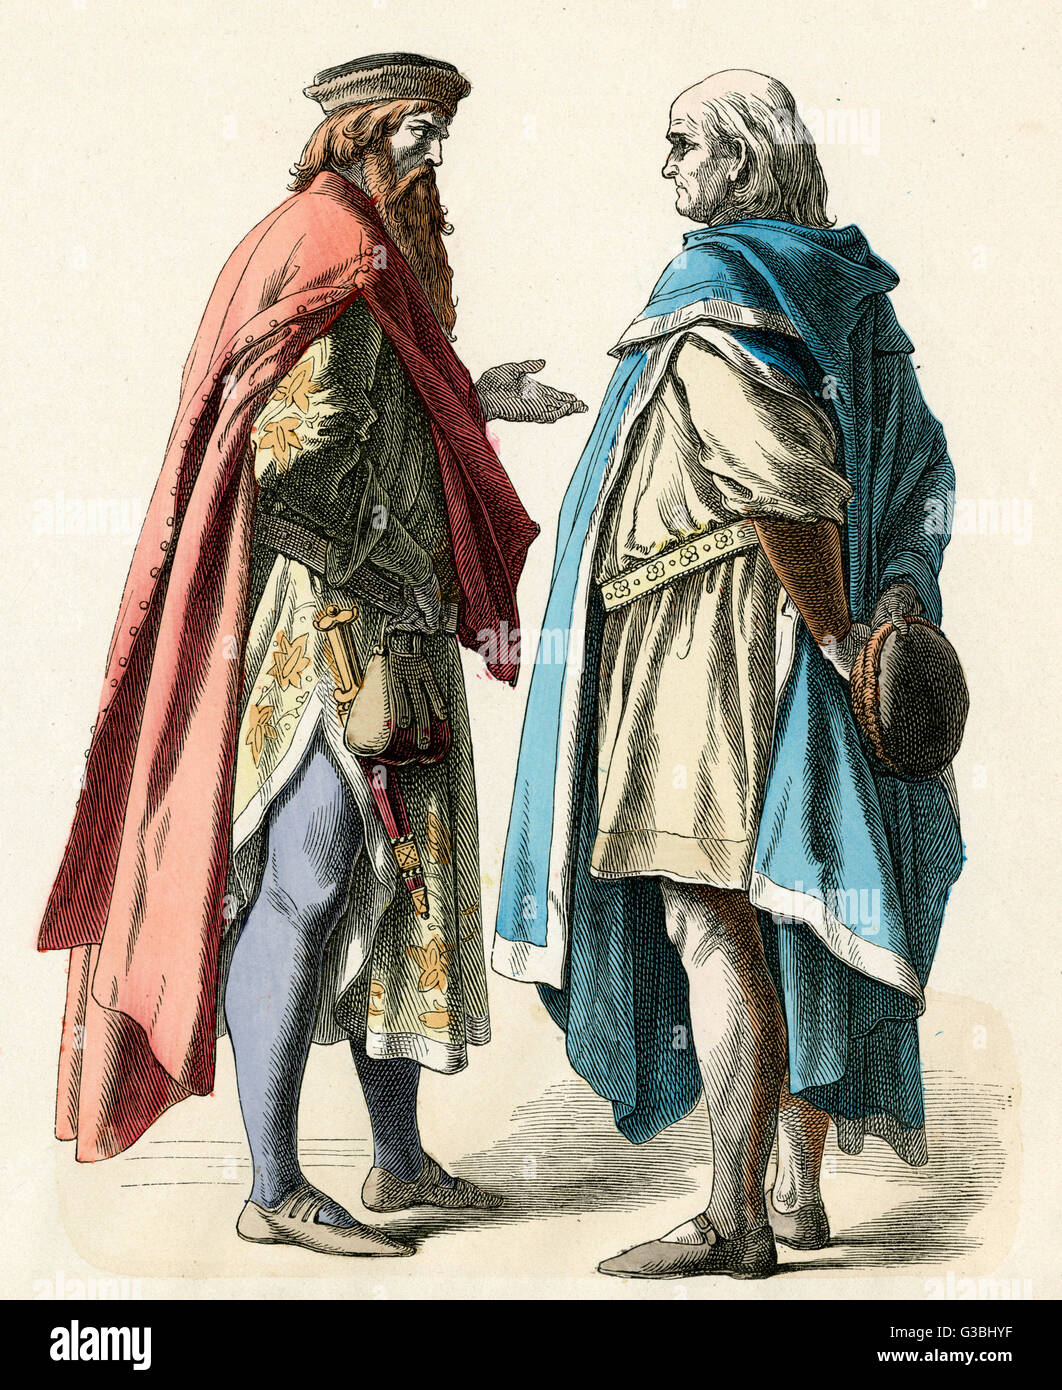 14th Century Clothing Stock Photos & 14th Century Clothing Stock